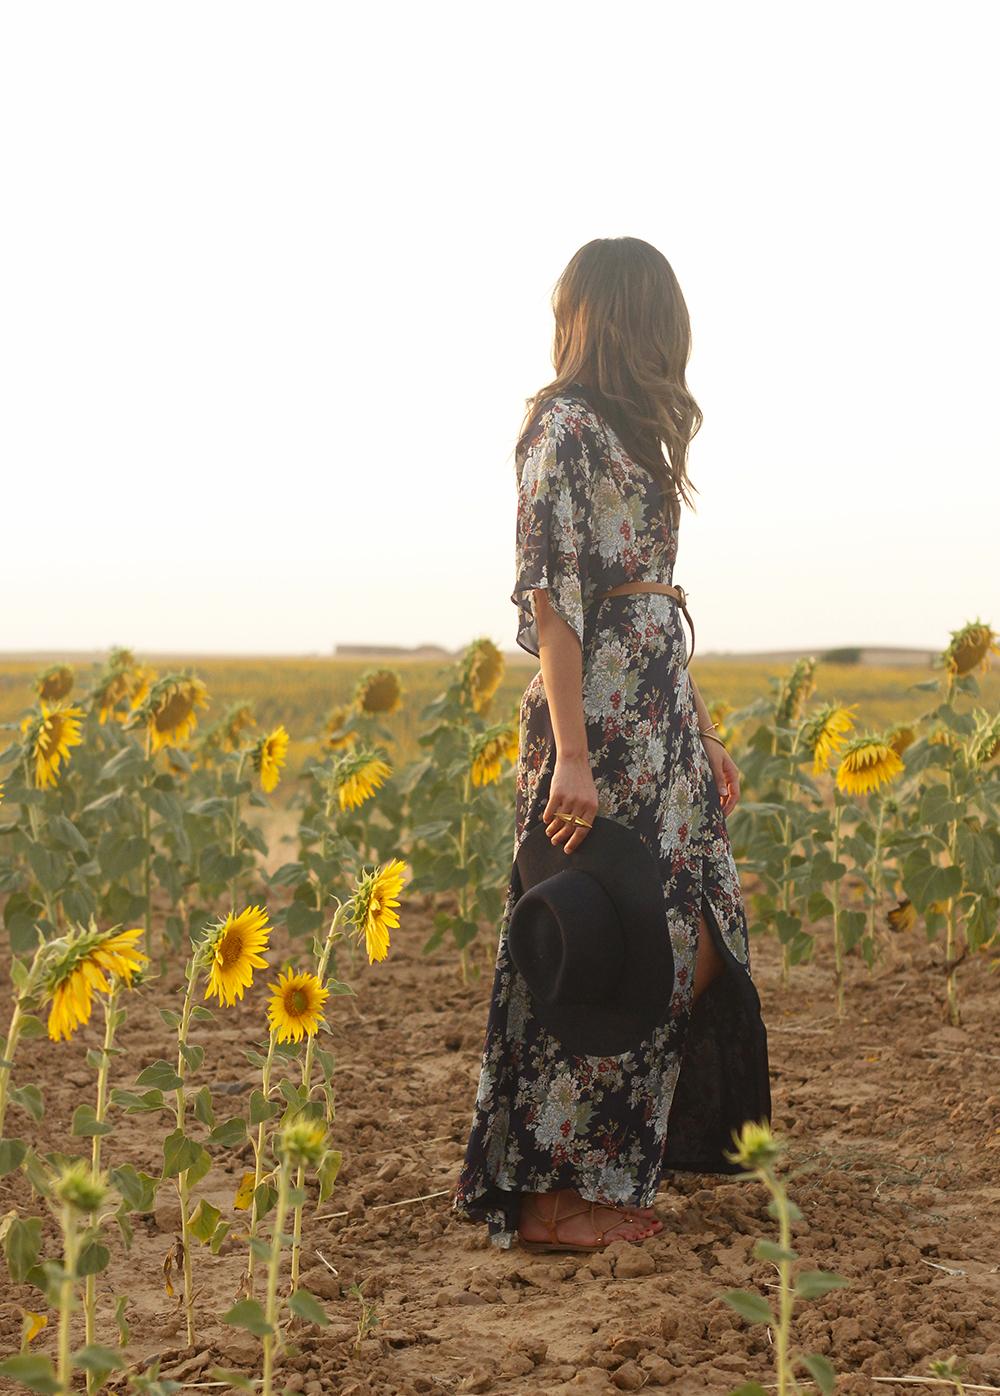 Maxi floral print dress uterqüe blue hat sunnies countryside summer outfit flat sandals massimo dutti28